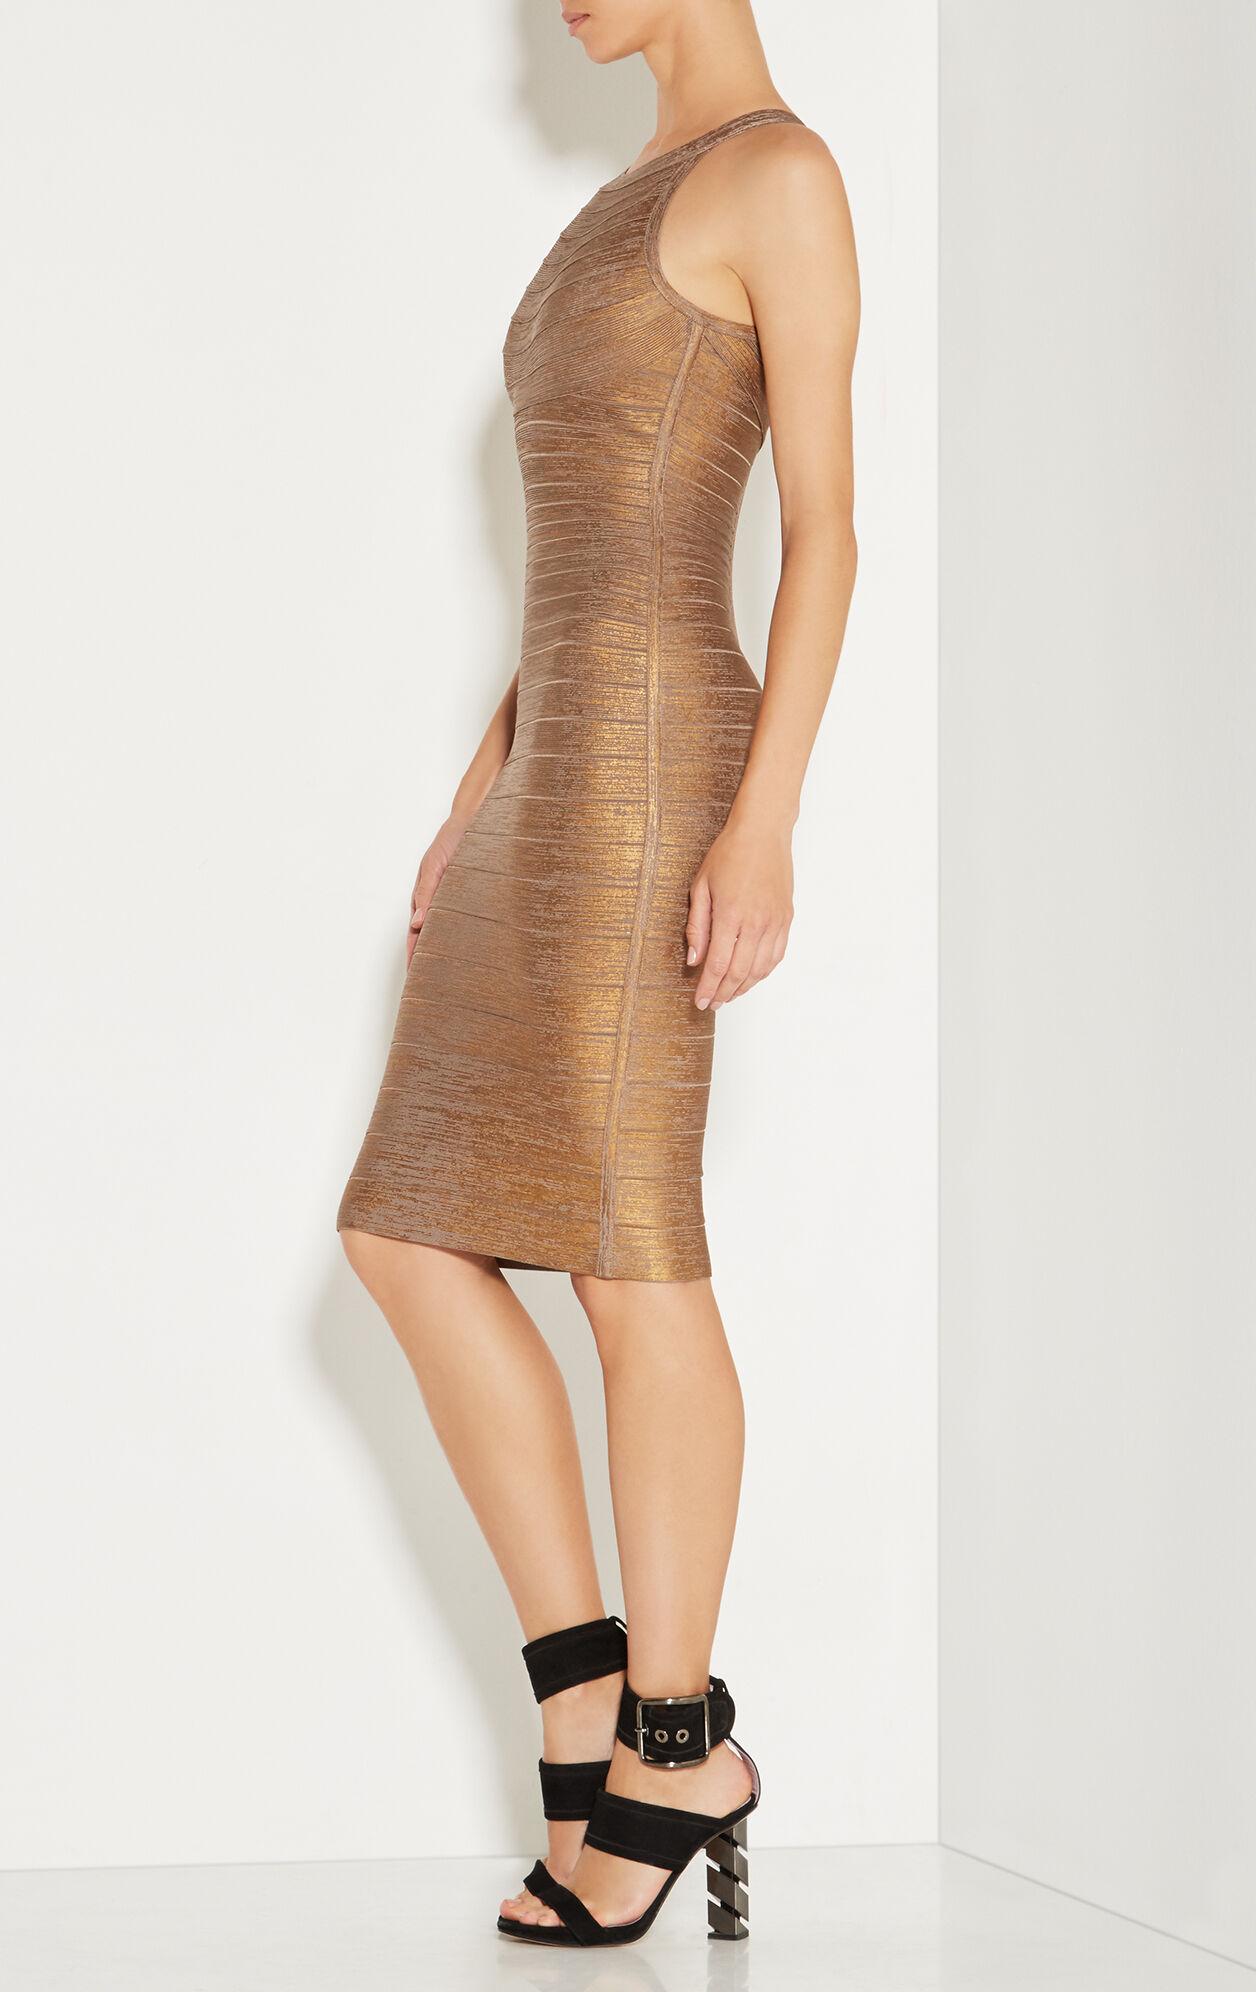 Renata Woodgrain Foil Print Dress